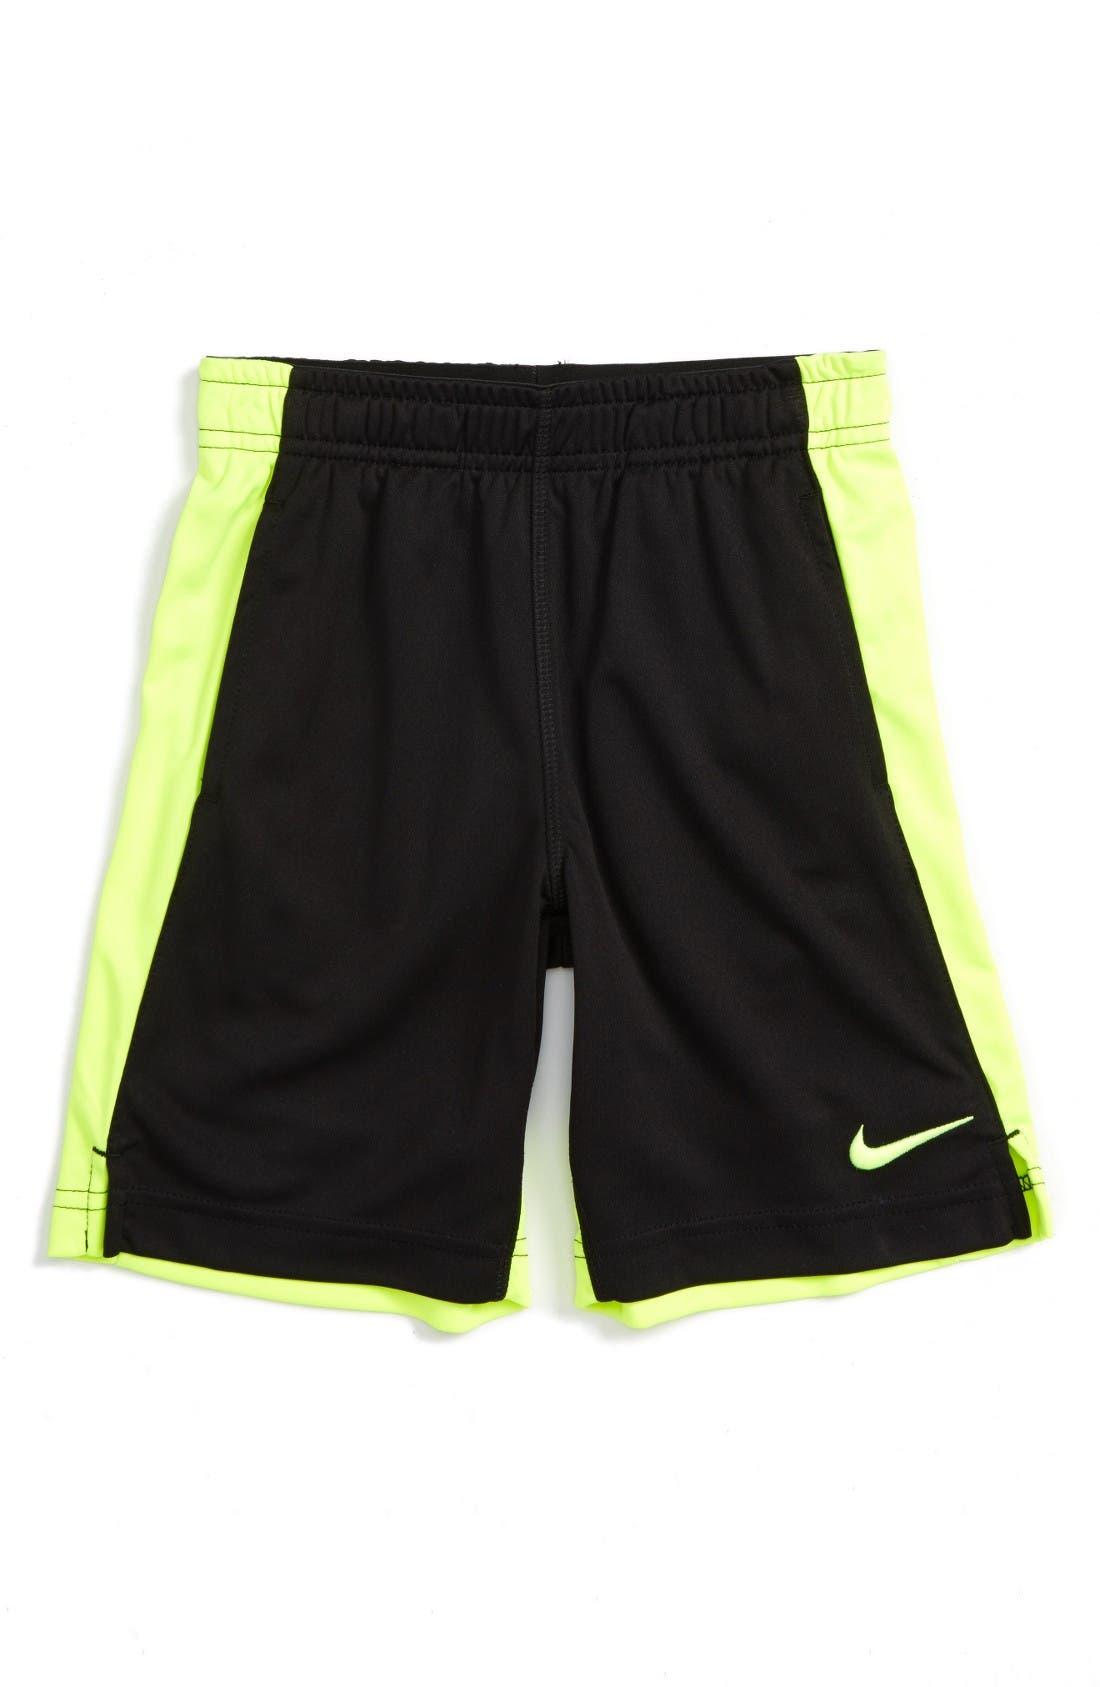 Alternate Image 1 Selected - Nike Dri-FIT Shorts (Toddler Boys & Little Boys)